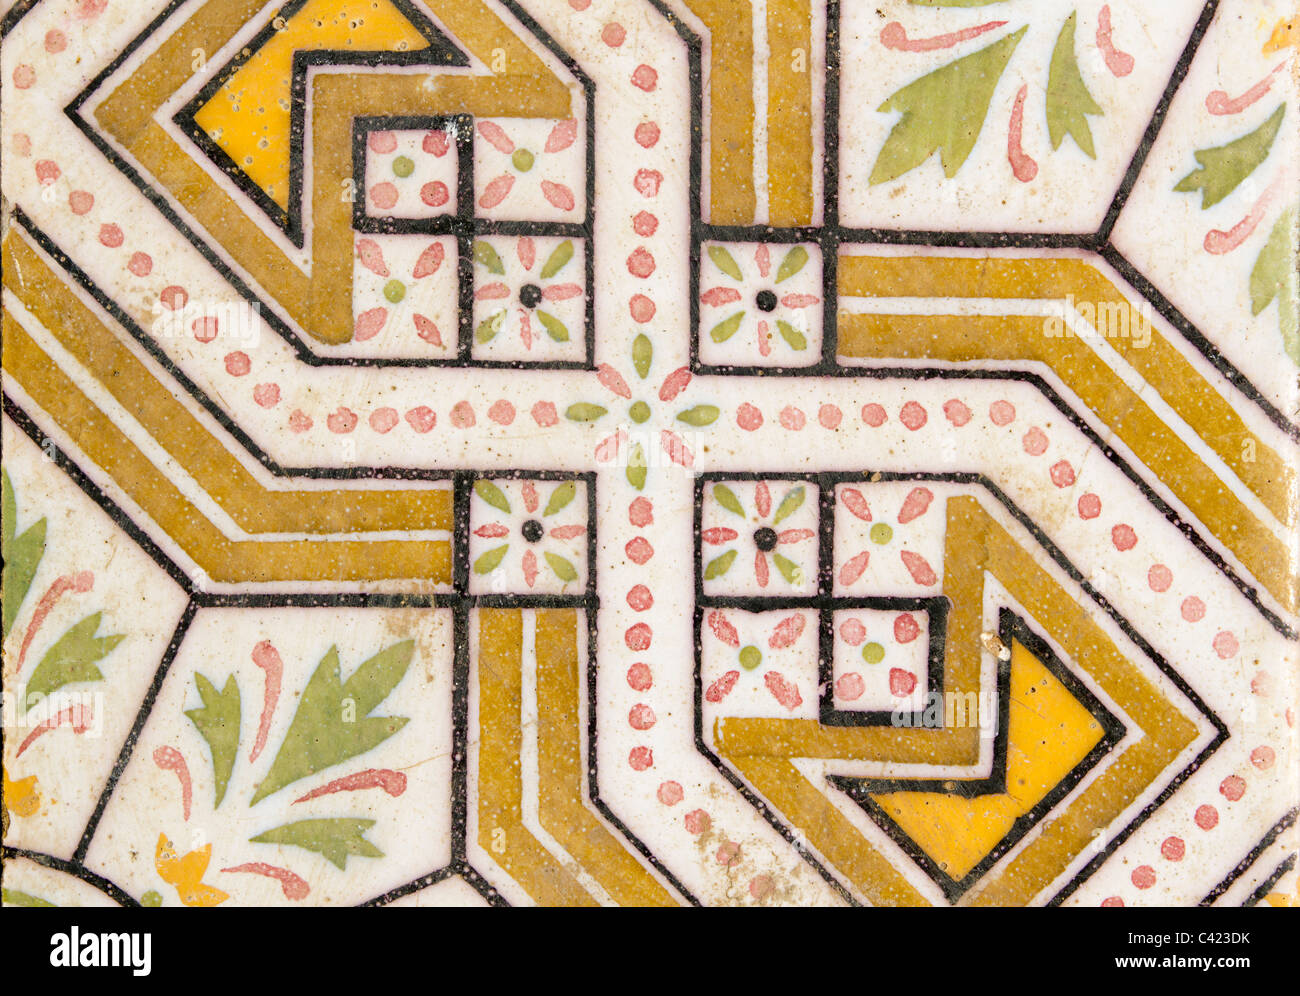 Famous 16X32 Ceiling Tiles Small 18 Inch Floor Tile Solid 18 X 18 Ceramic Tile 20 X 20 Floor Tile Patterns Old 24 X 24 Ceiling Tiles Gray3 X 12 Subway Tile Arab Traditional Ceramic Floor Tile Flower Design Antique Stock ..